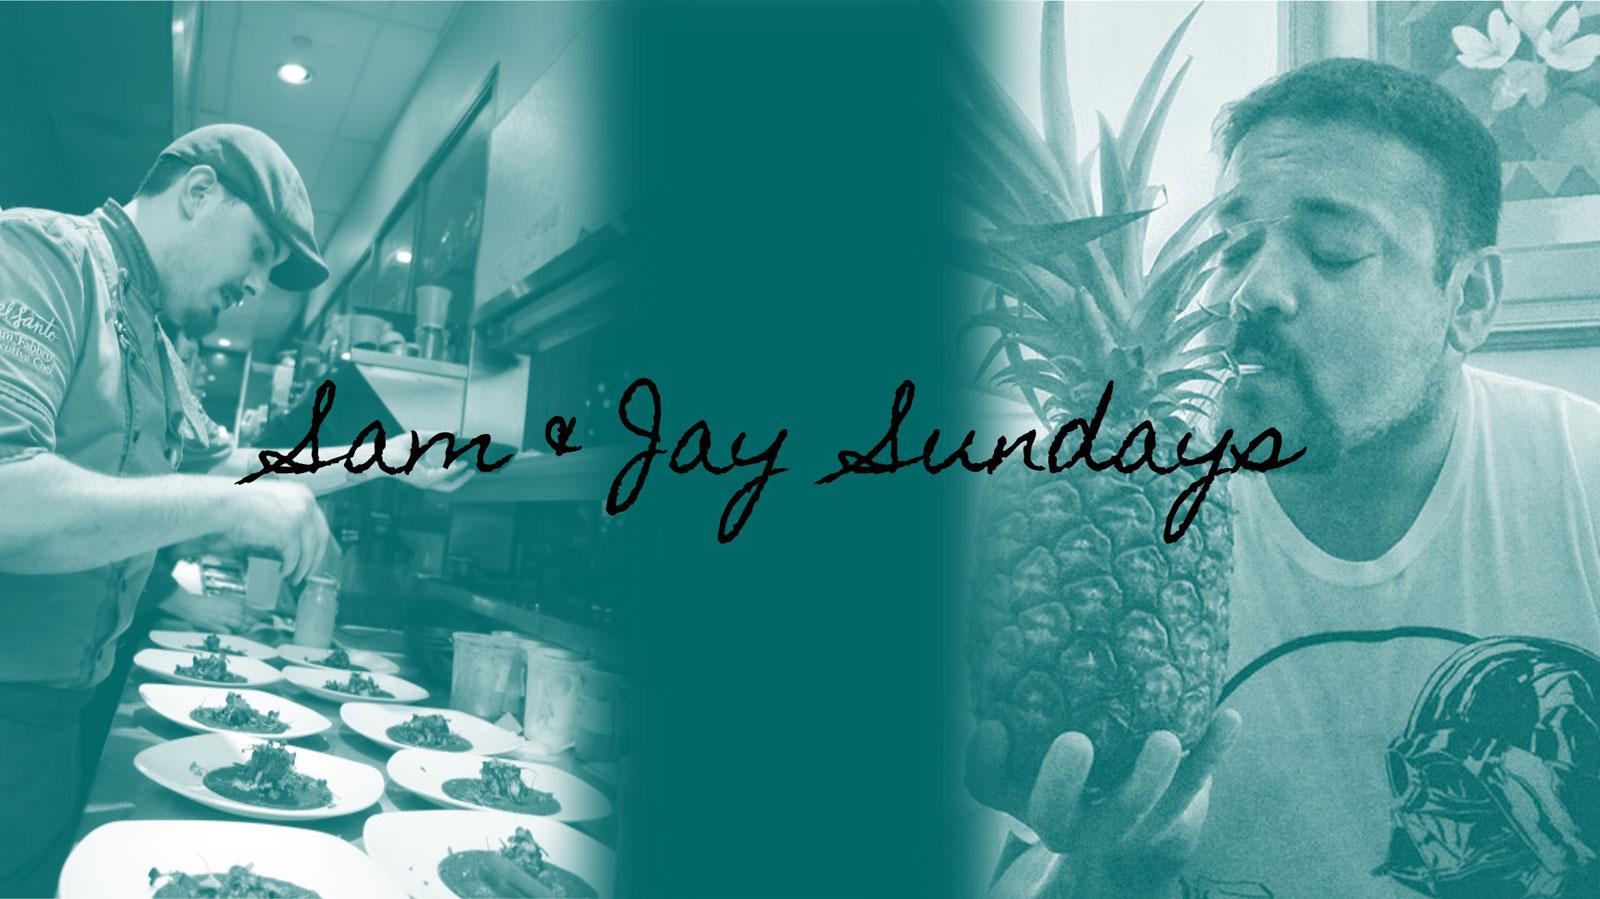 Sam & Jay Sundays Vol. 2 Set for September 29th at New Westminster's El Santo